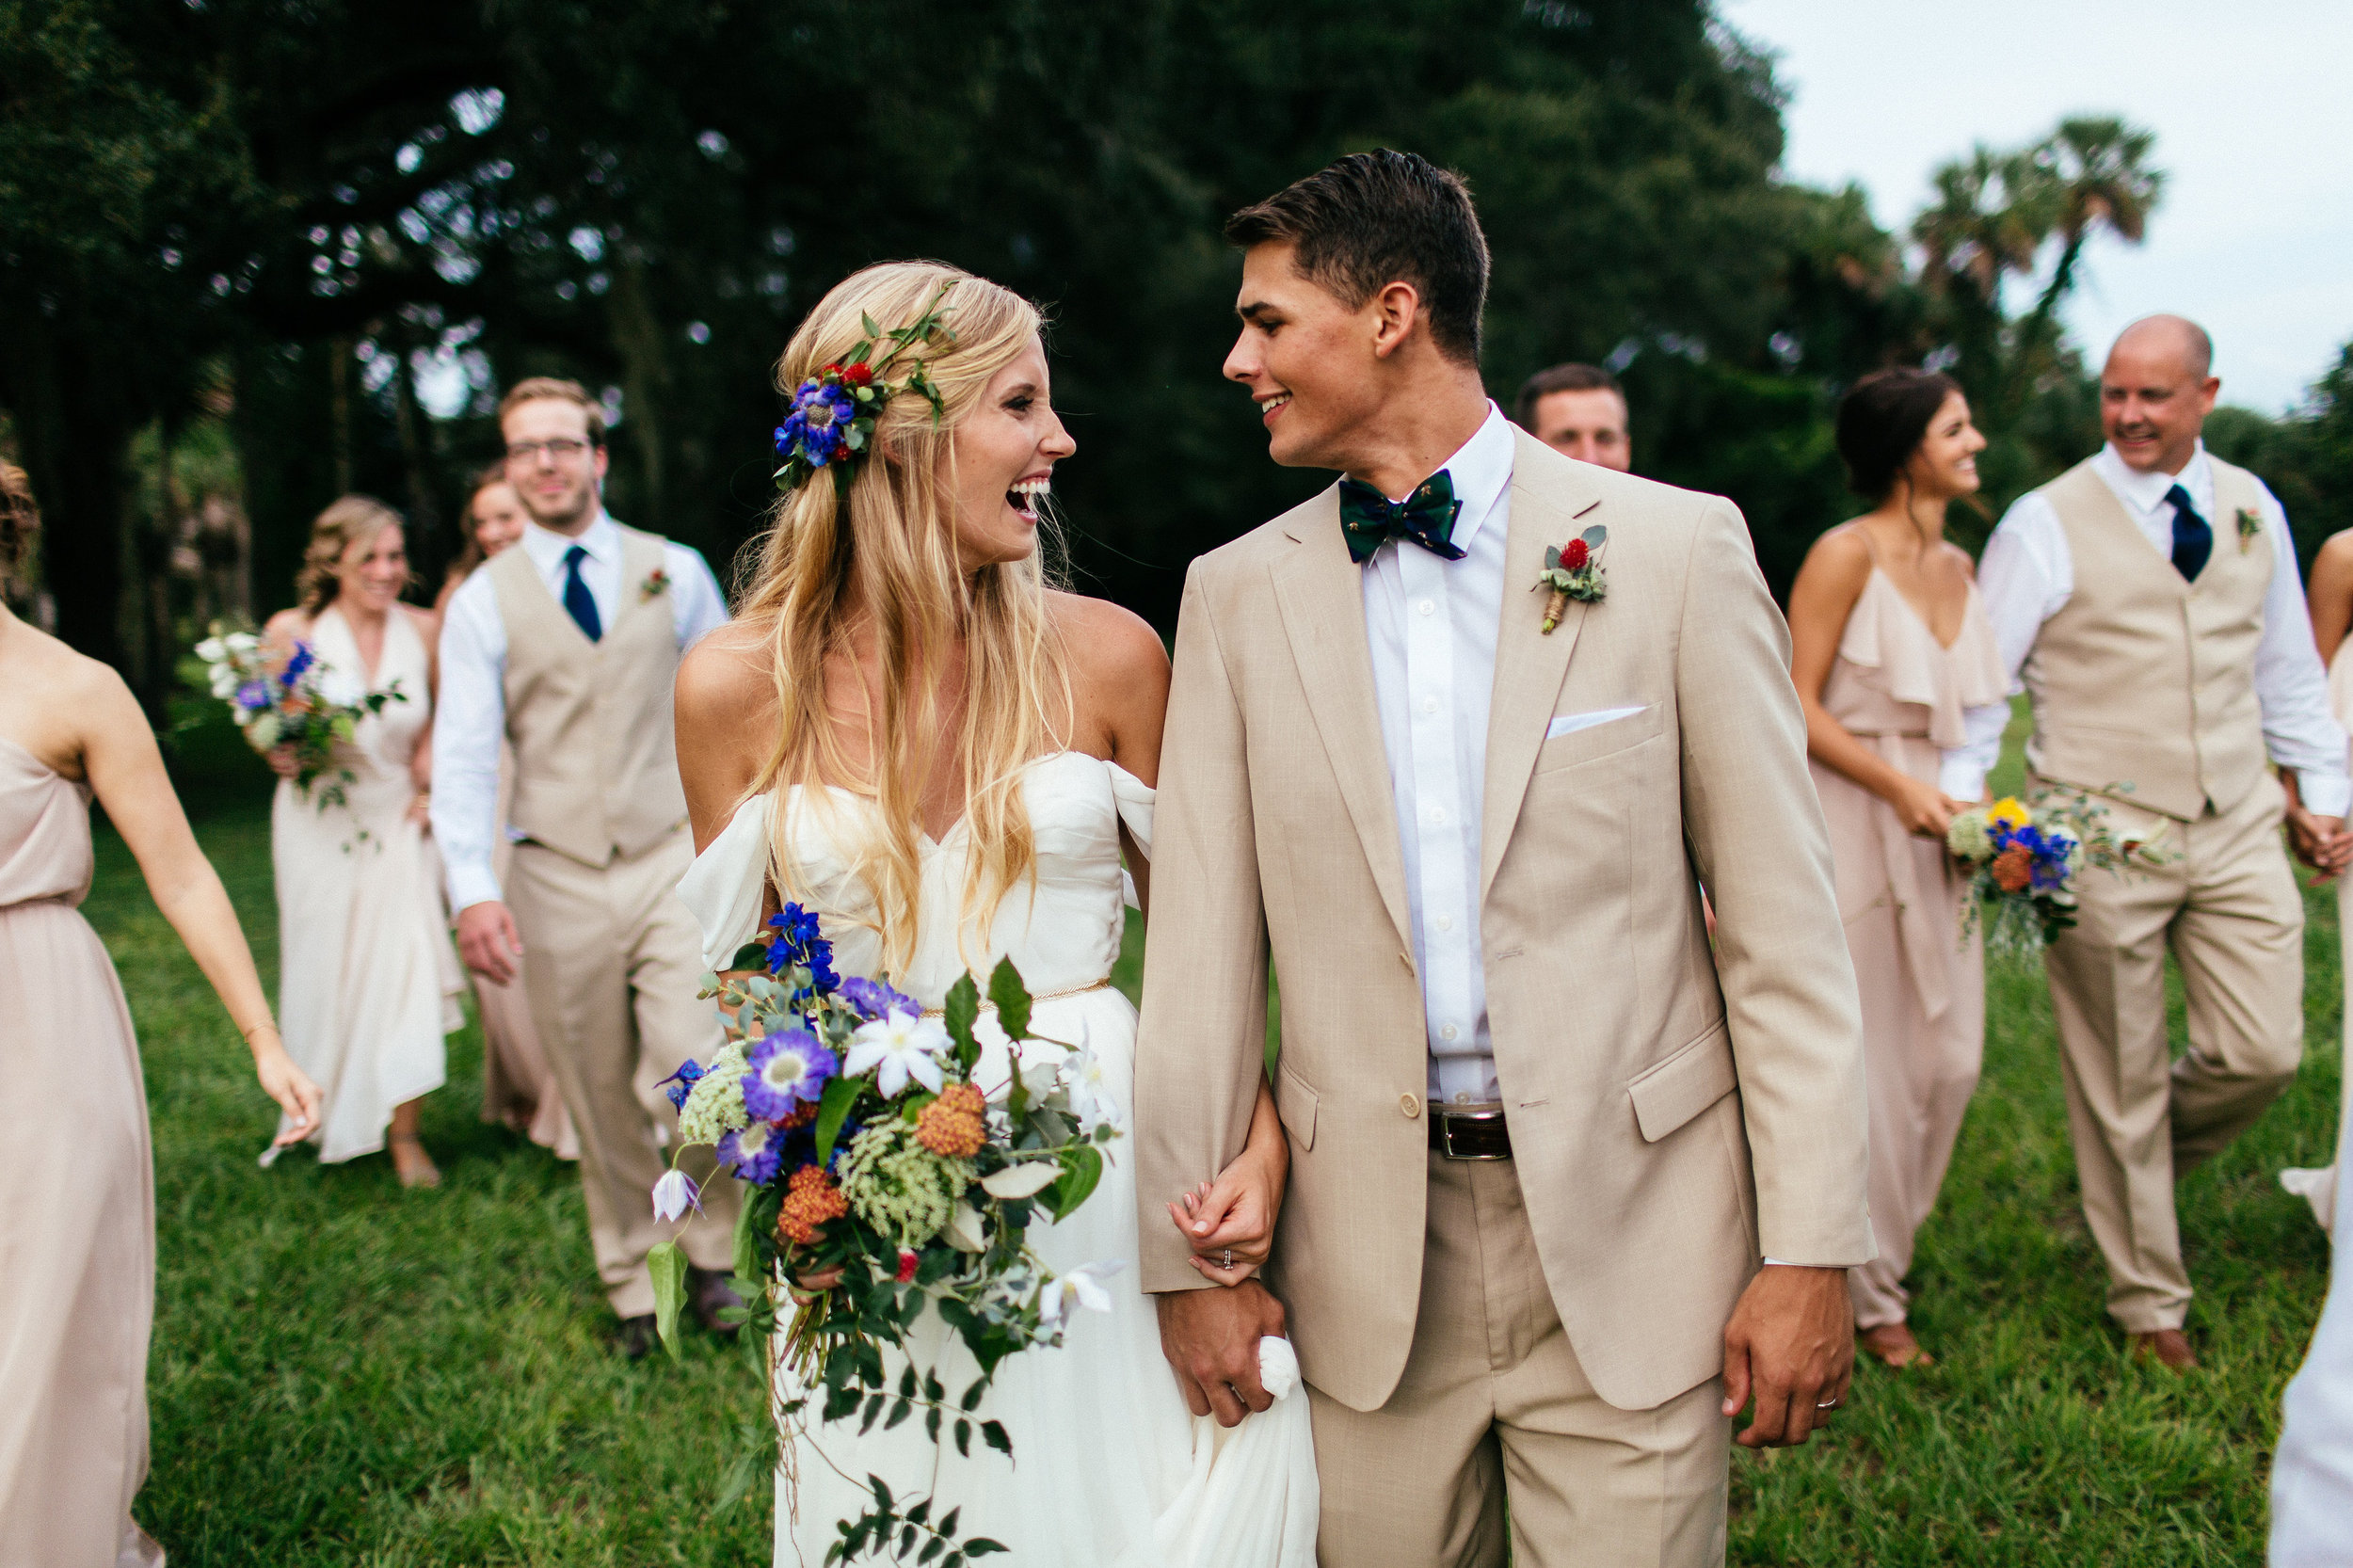 christina-karst-photography-ivory-and-beau-bridal-boutique-sarah-seven-lafayette-boho-bride-boho-bridal-boutique-indie-bridal-boutique-savannah-bridal-boutique-savannah-wedding-dresses-savannah-bridal-gowns-17.jpg